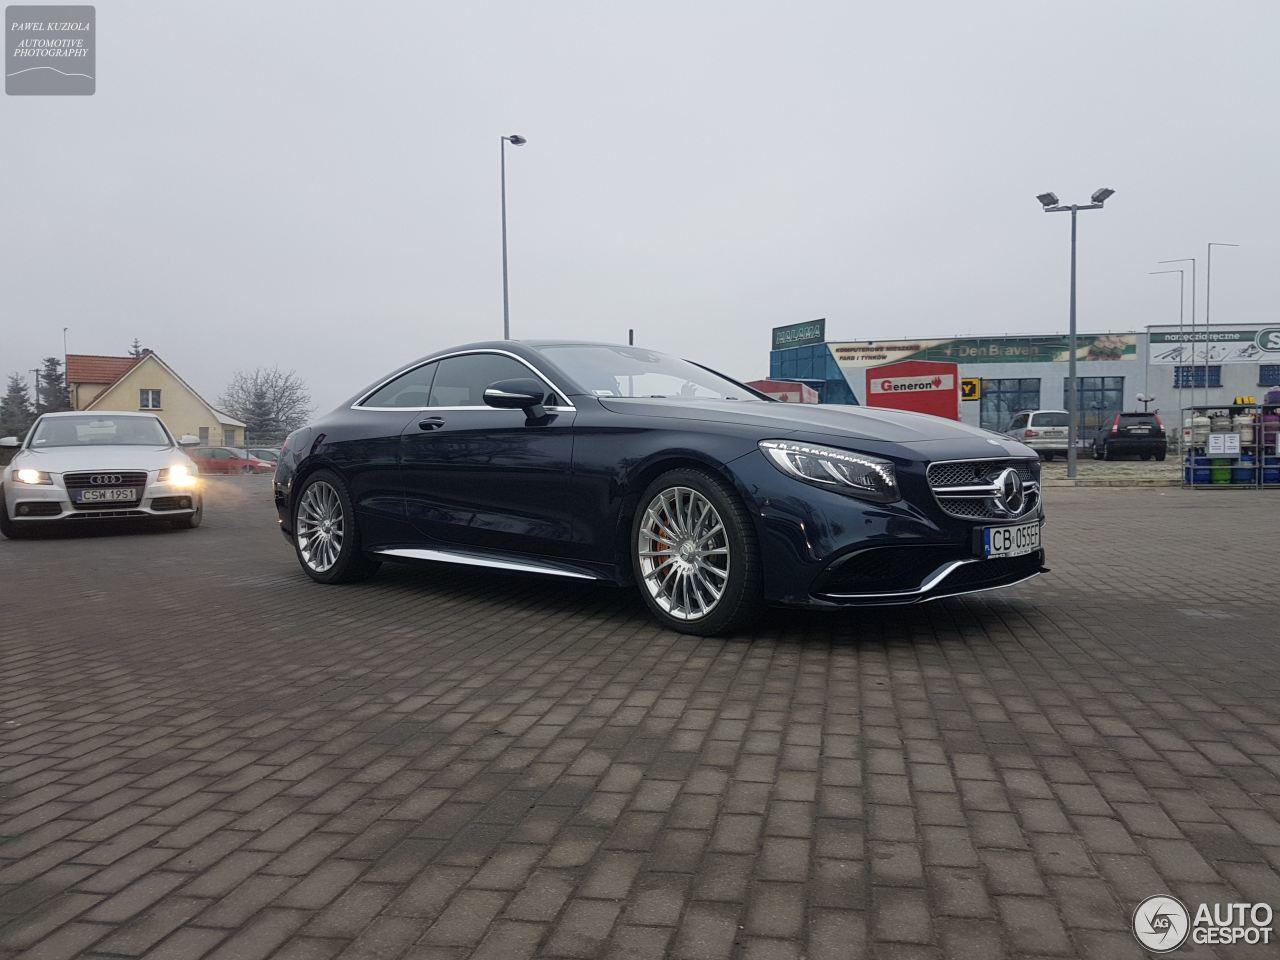 Mercedes benz s 65 amg coup c217 25 december 2017 for Mercedes benz 65